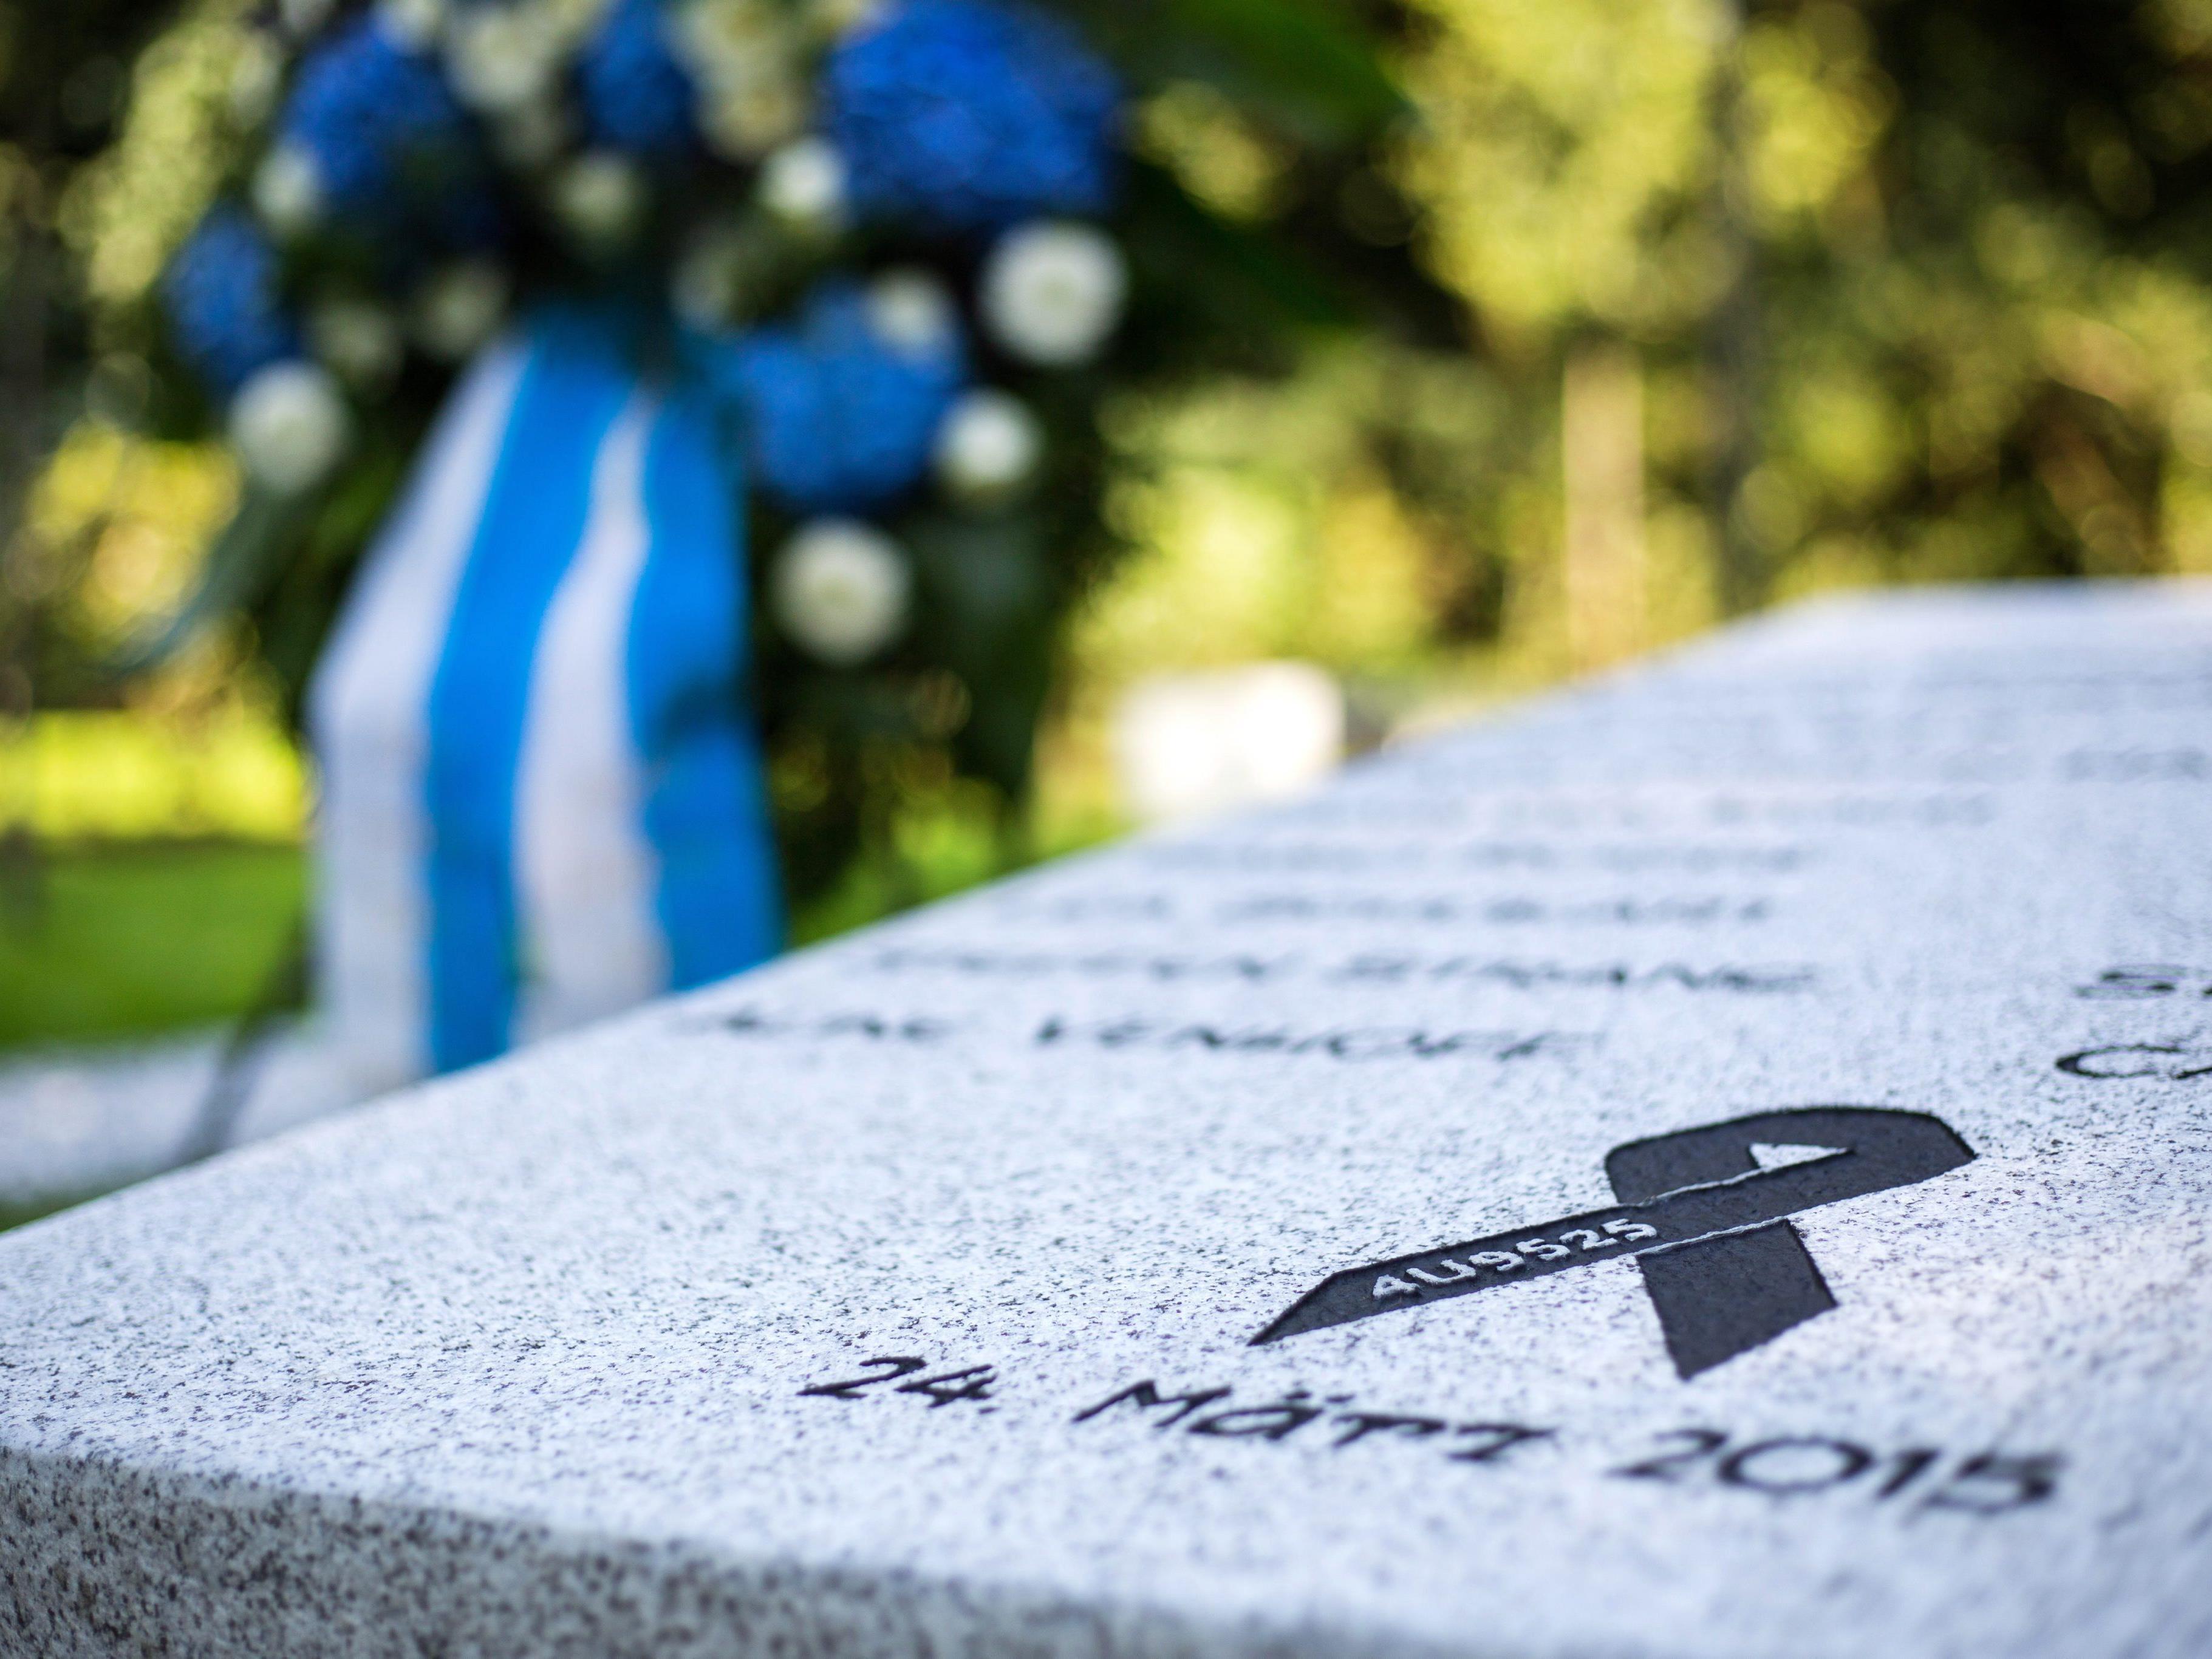 Neben dem Co-Piloten kamen bei dem Flugzeugabsturz 149 Menschen ums Leben.